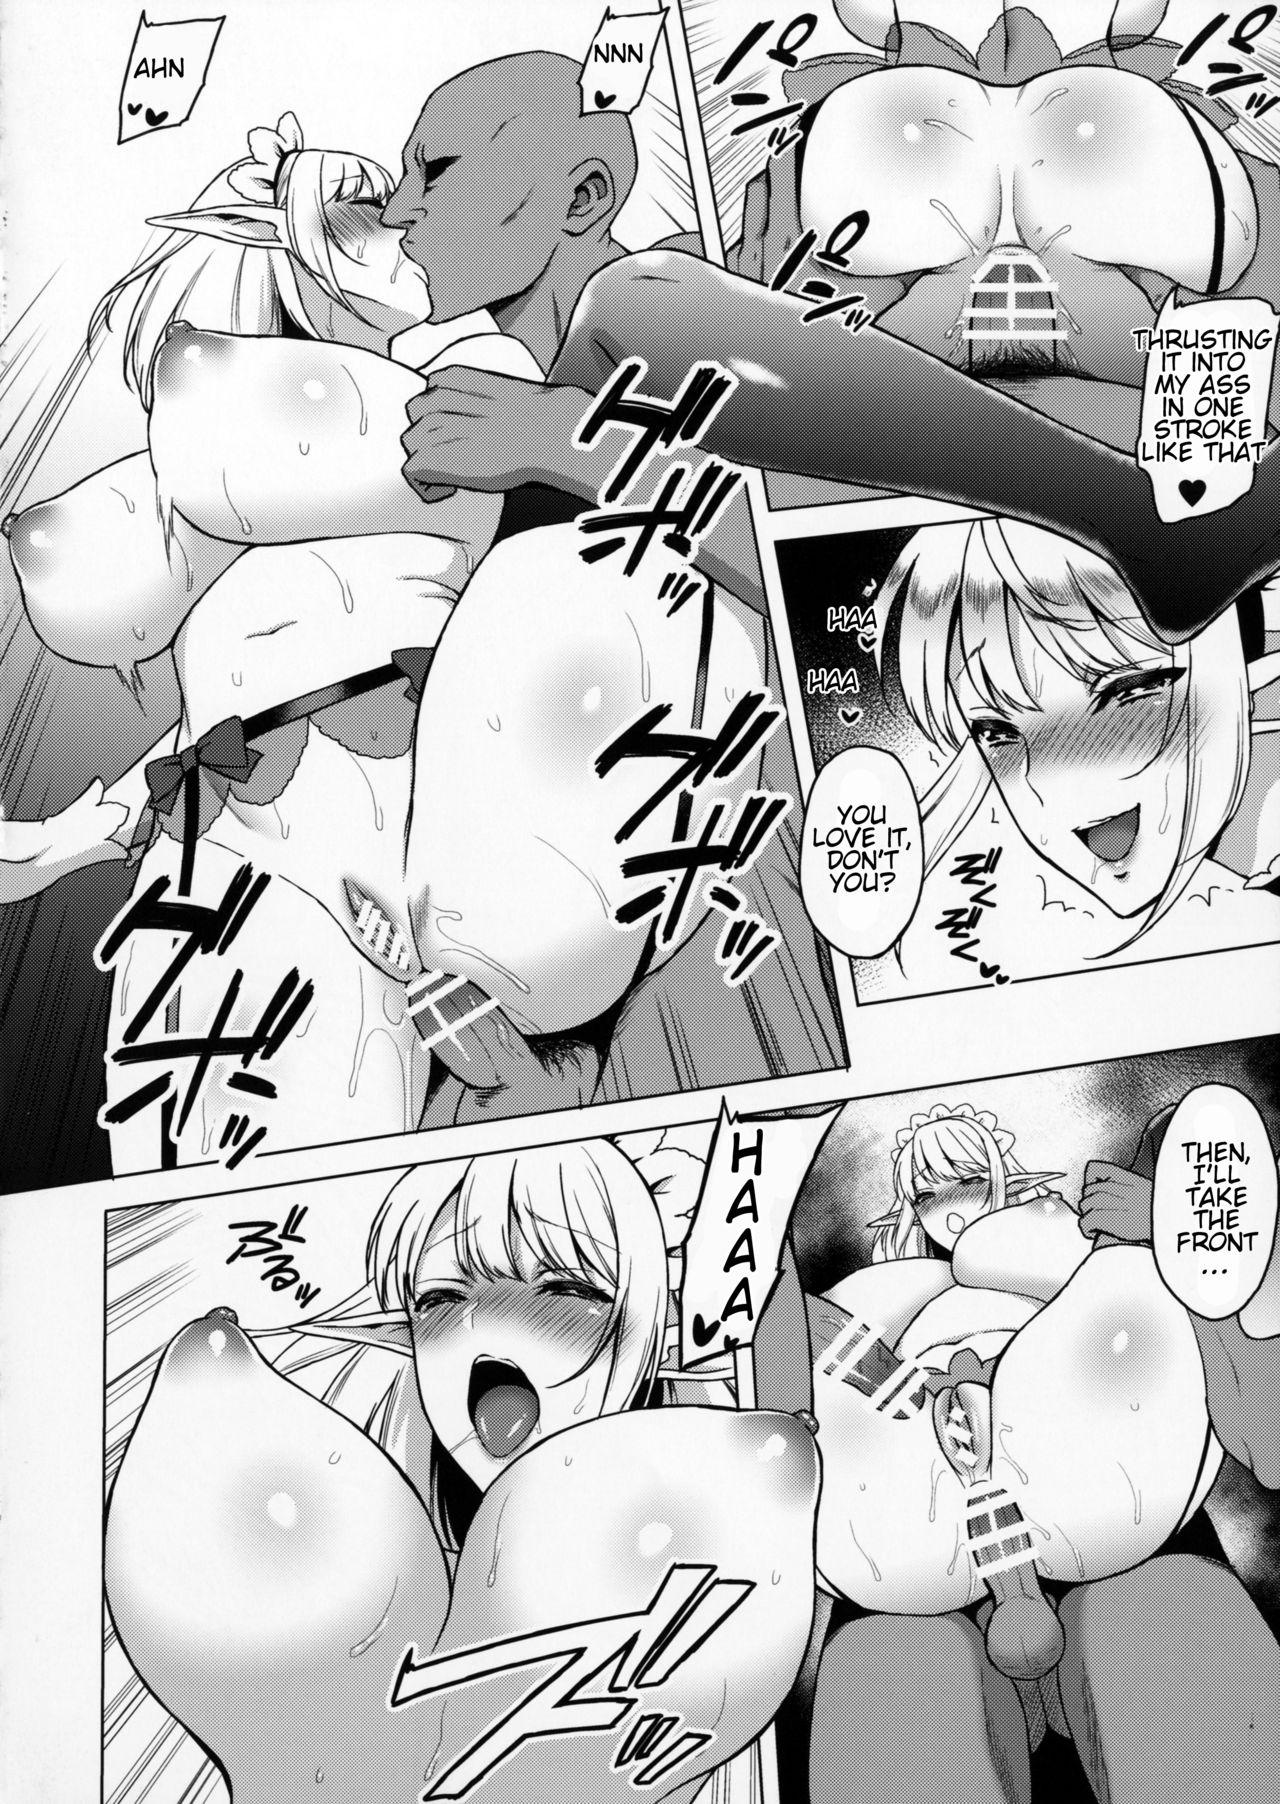 Reizoku Elf Maid + C91 Kaijou Genteibon | Elf Maid Slaves 17